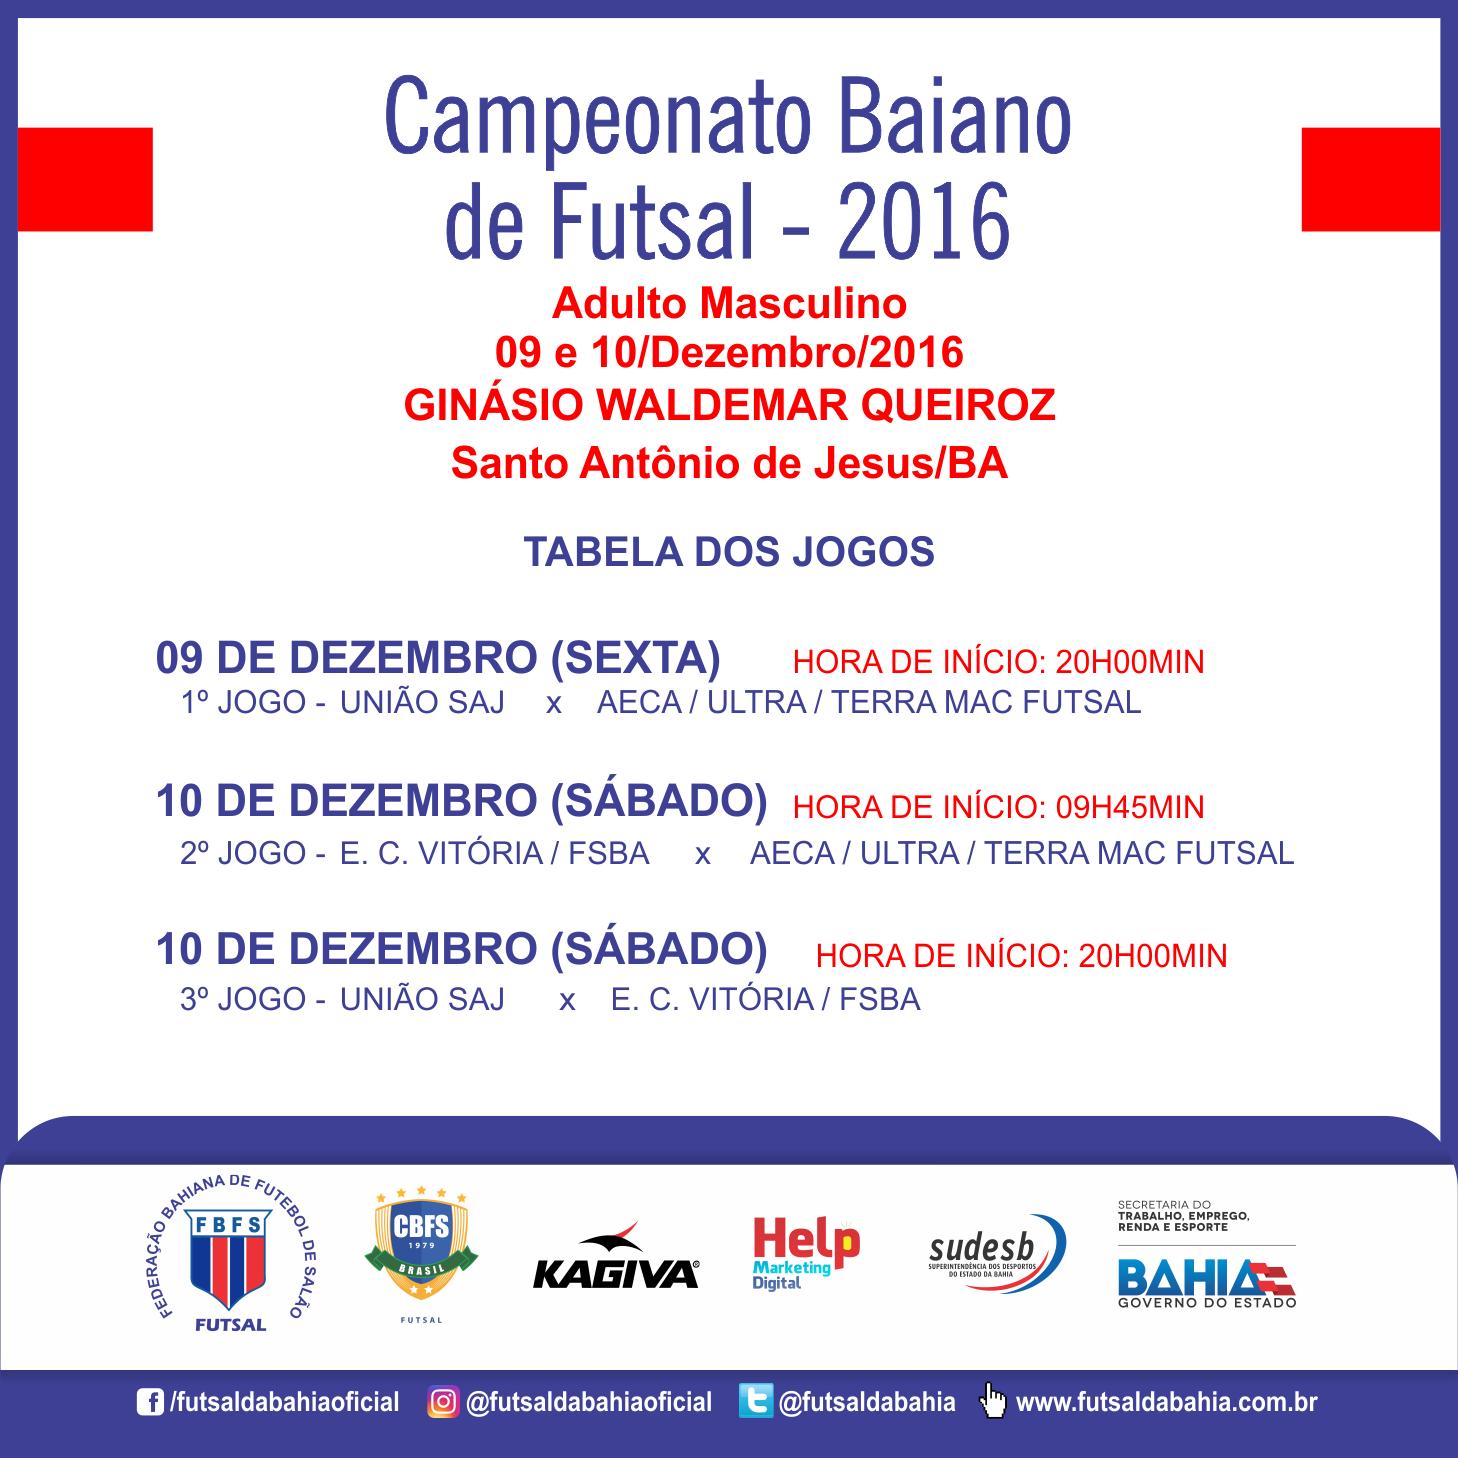 Tabela de Jogos - Campeonato Baiano 2016 - Adulto Masculino